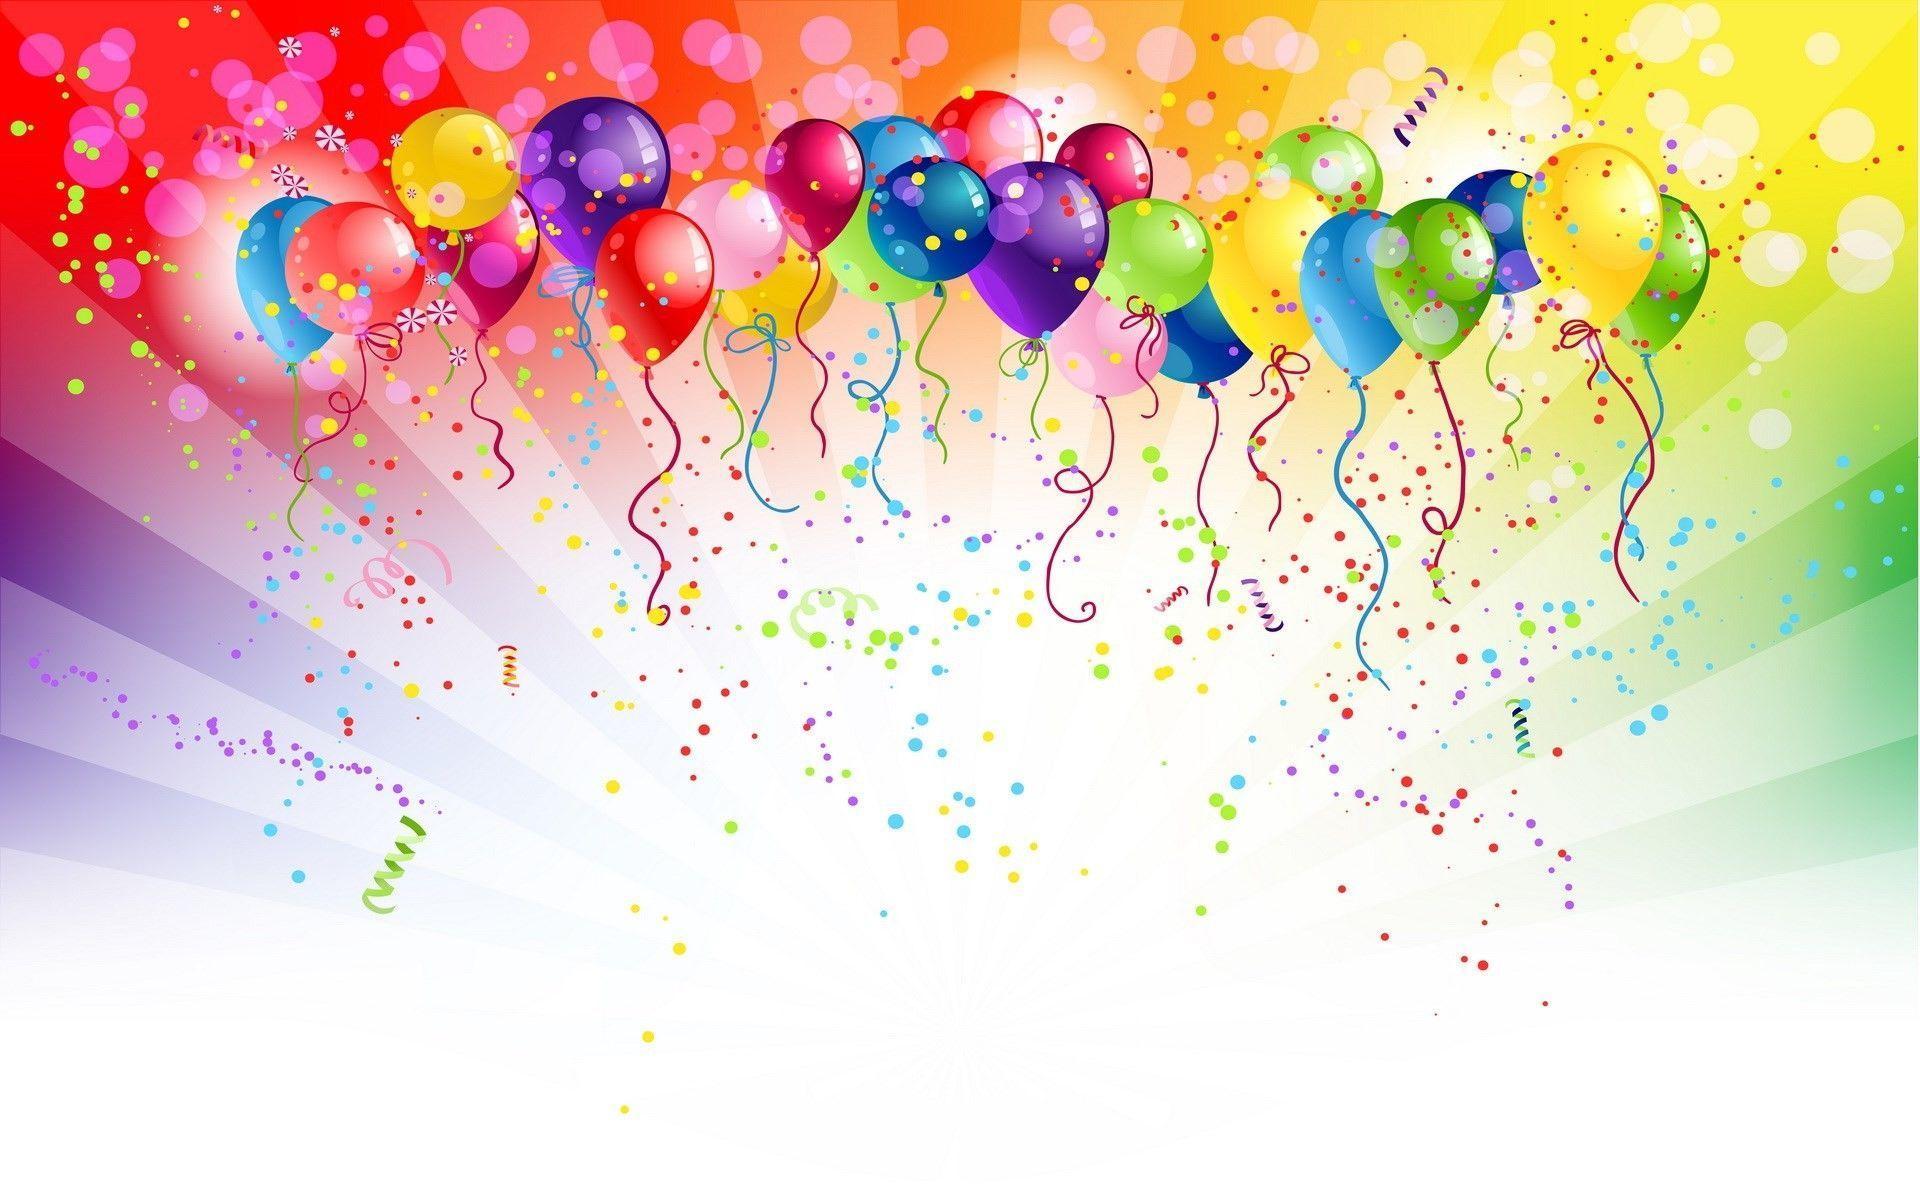 Birthday Balloons Wallpapers Top Free Birthday Balloons